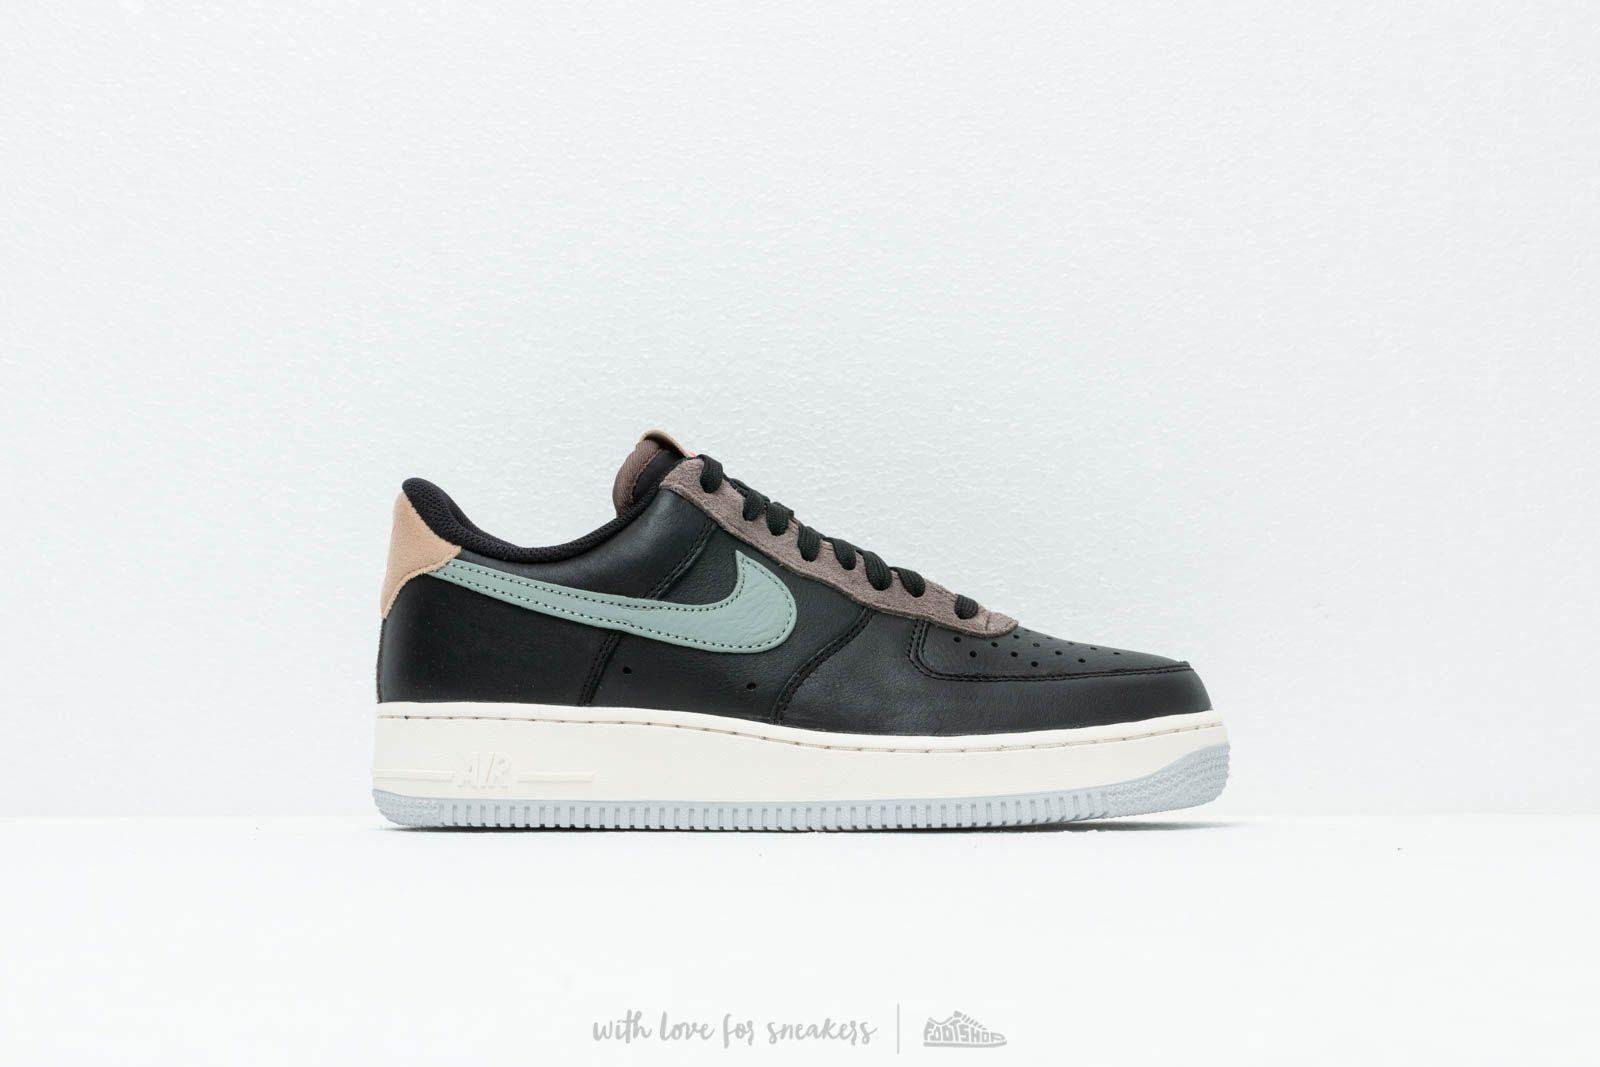 best sneakers 6d7b9 32f8b Nike Air Force 1  07 Black  Mica Green-Ridgerock at a great price